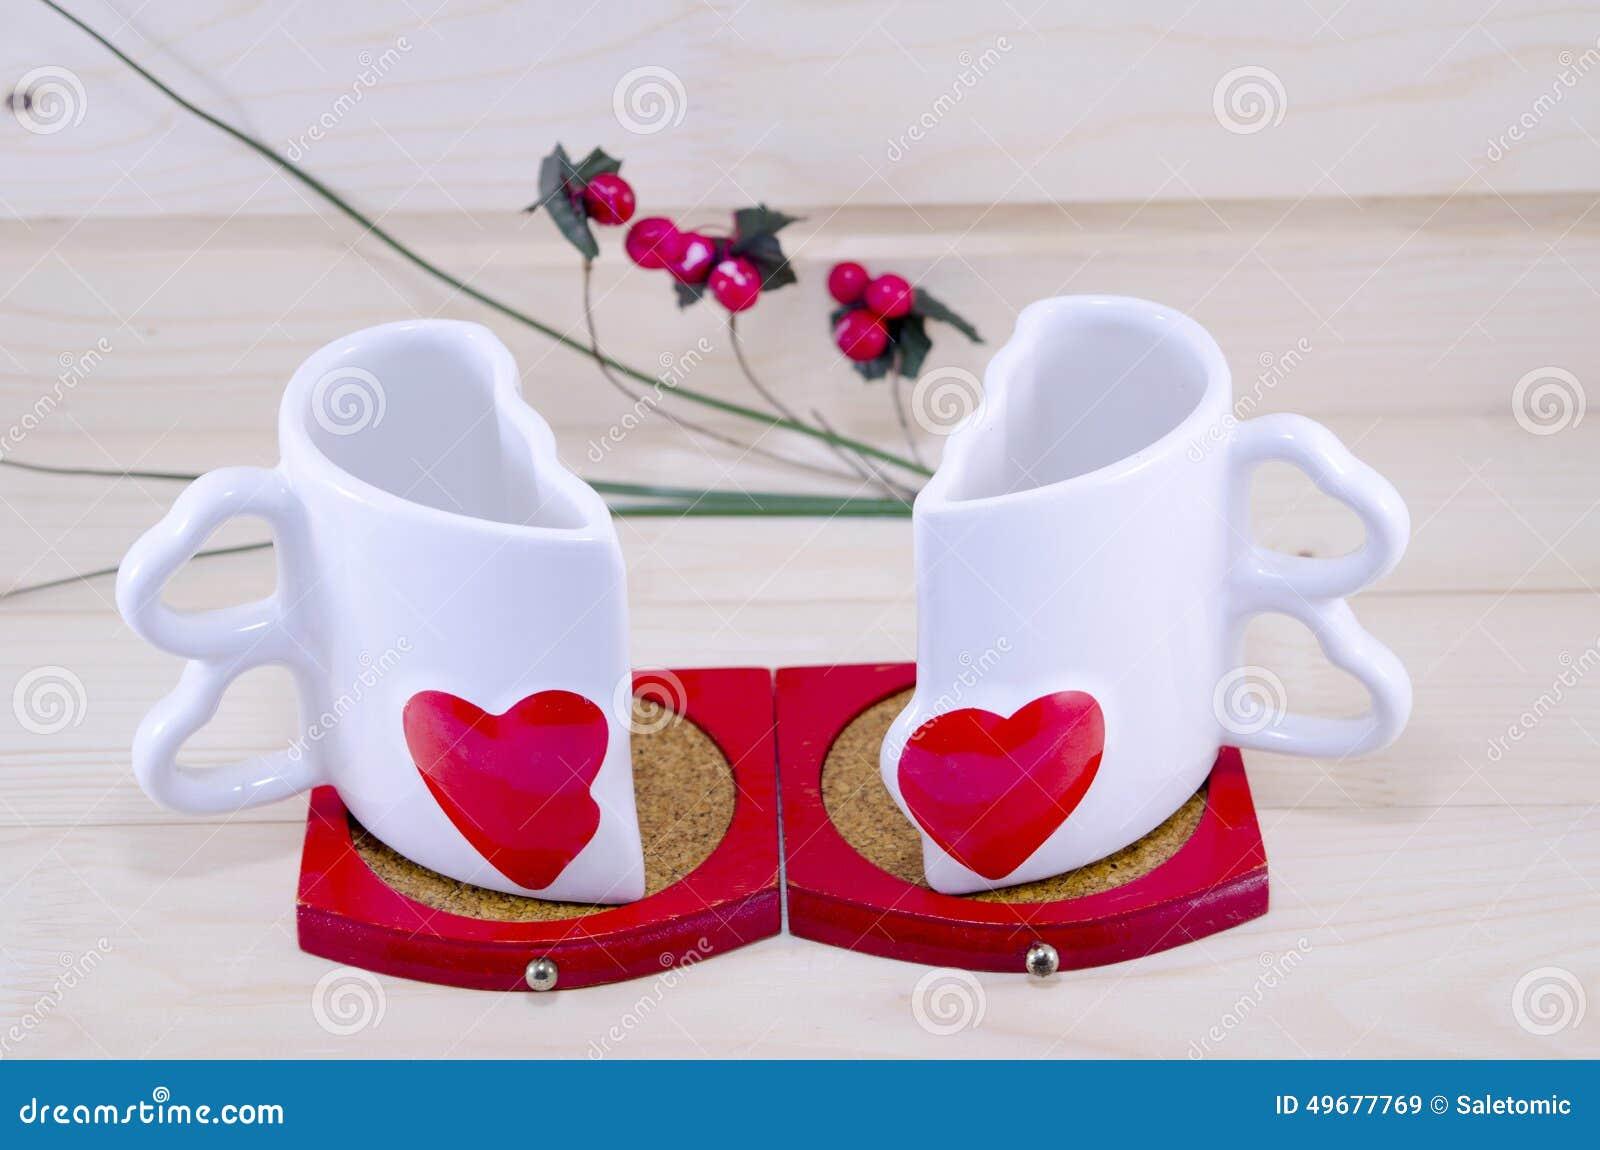 Unique Heart Shaped Coffee Mug Split Apart Stock Photo